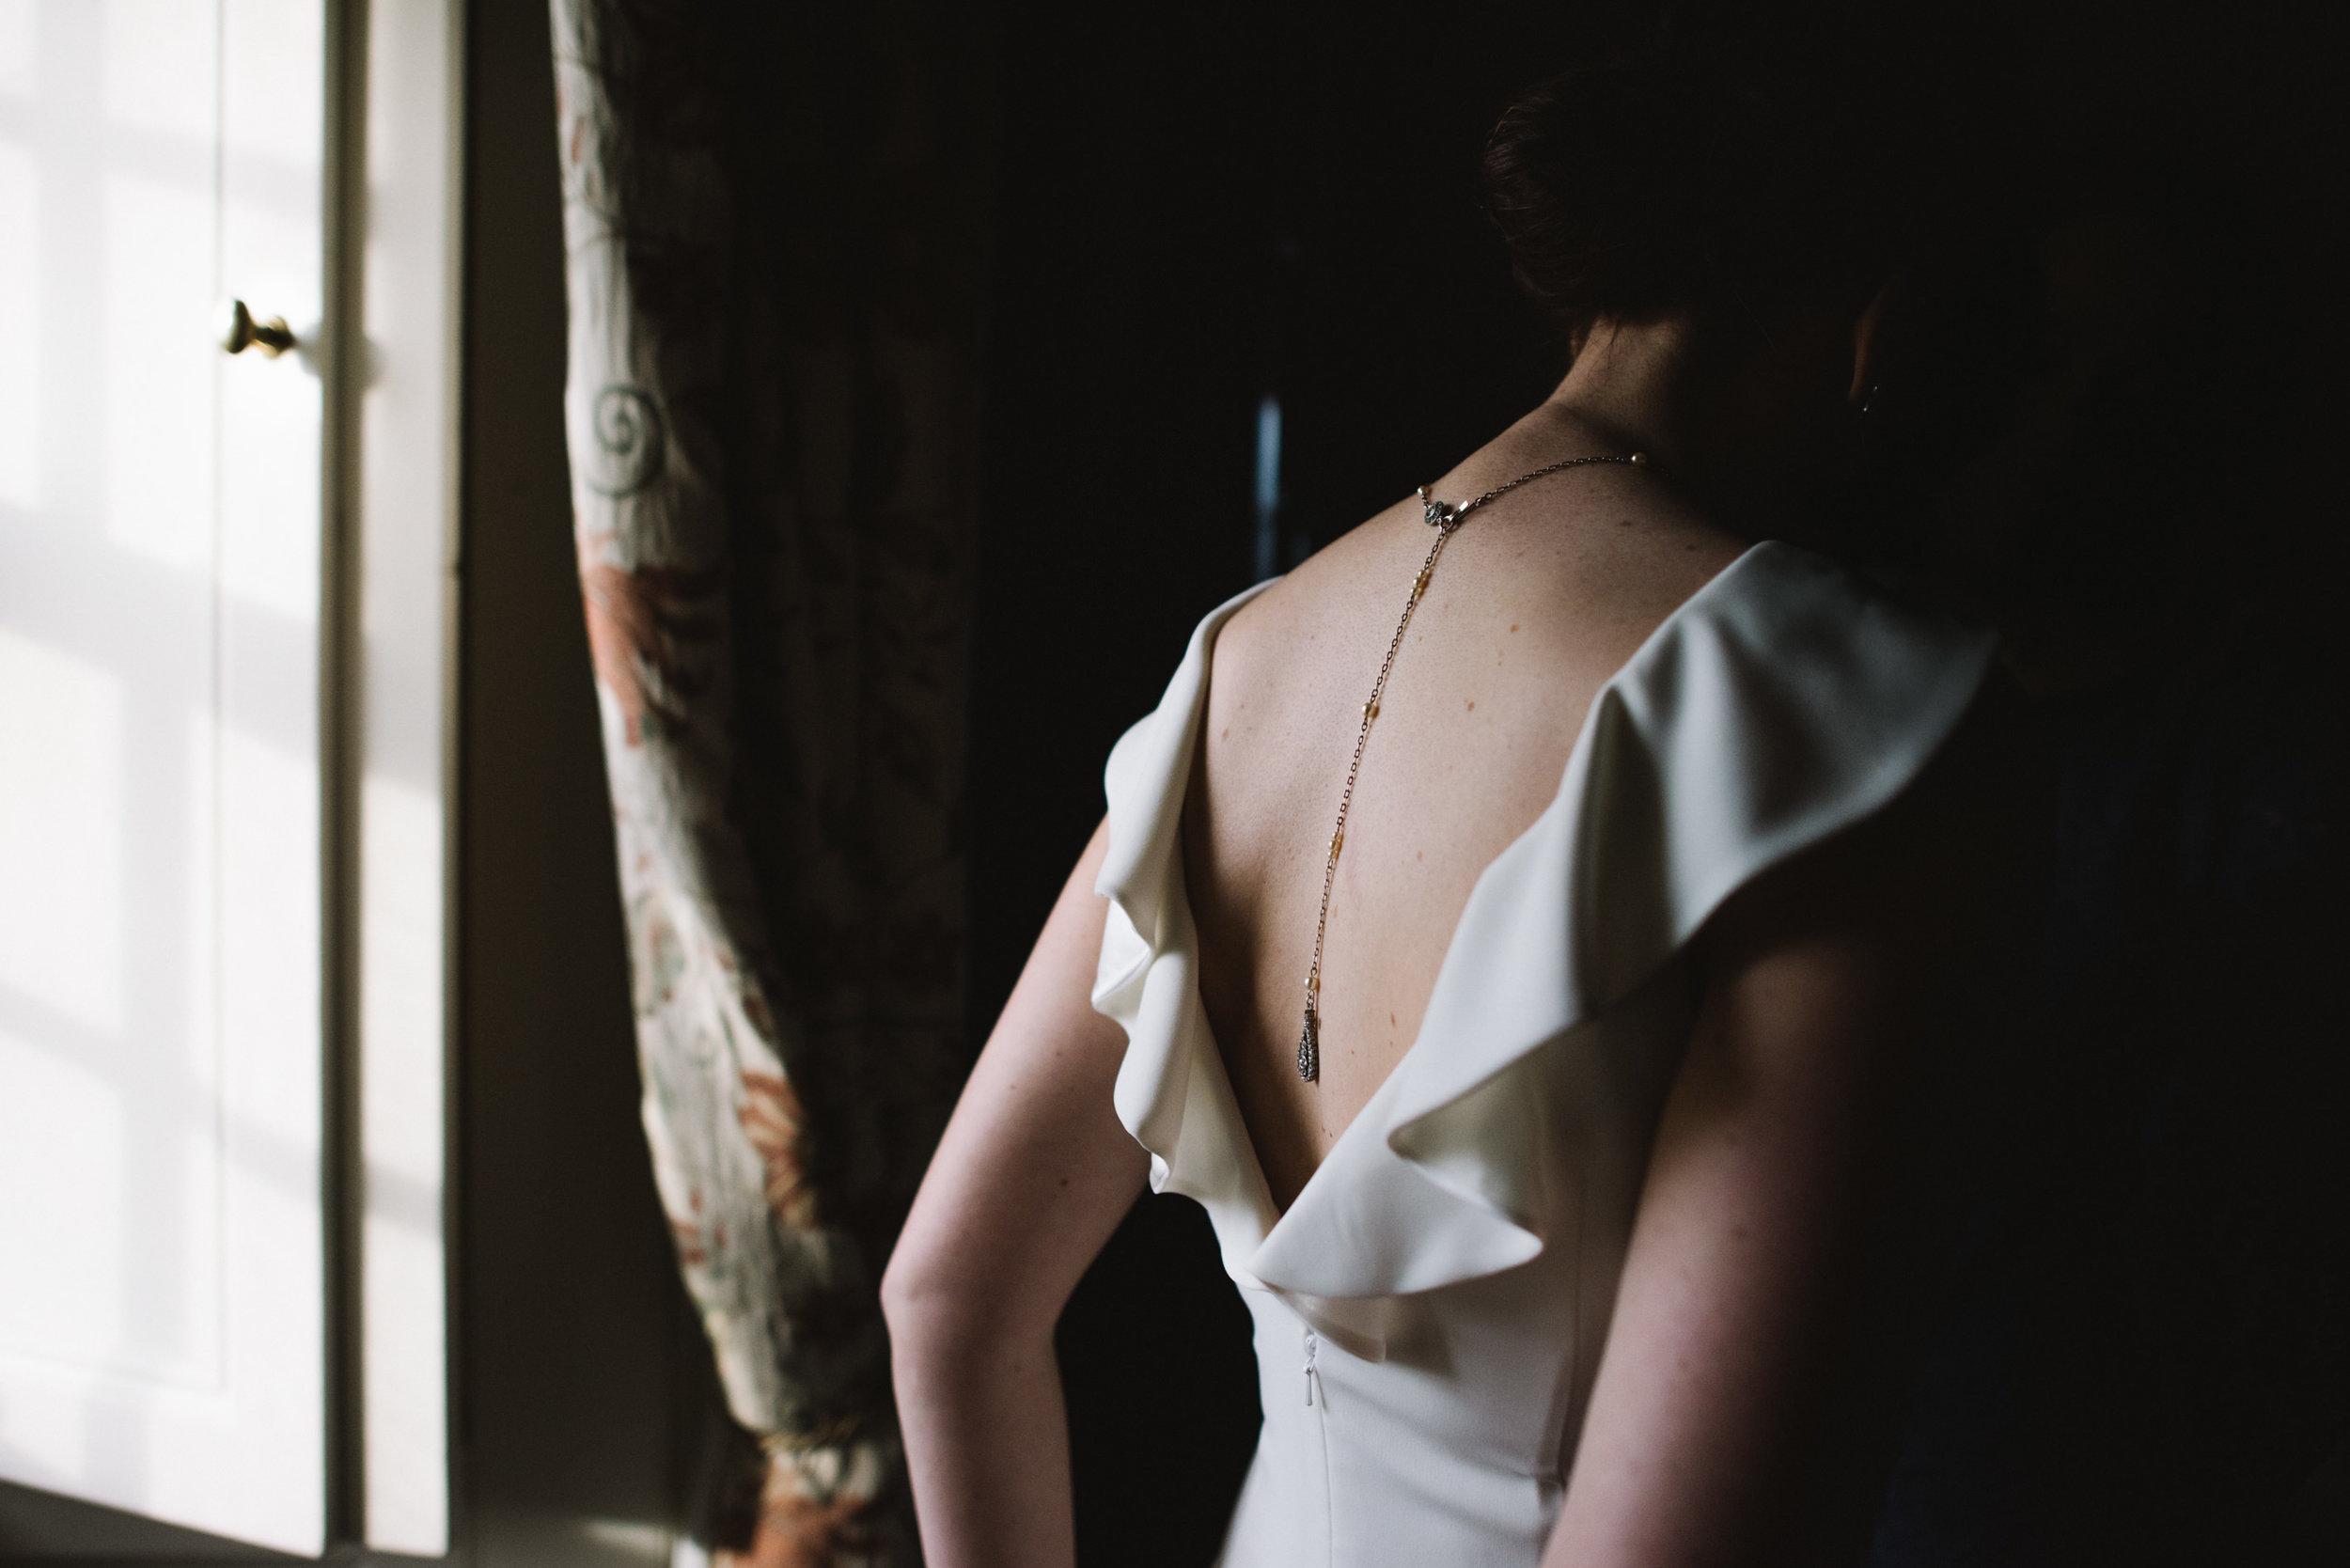 0018-LISA-DEVINE-PHOTOGRAPHY-ALTERNATIVE-WEDDING-PHOTOGRAPHY-SCOTLAND-DESTINATION-WEDDINGS-GLASGOW-WEDDINGS-COOL-WEDDINGS-STYLISH-WEDDINGS.JPG